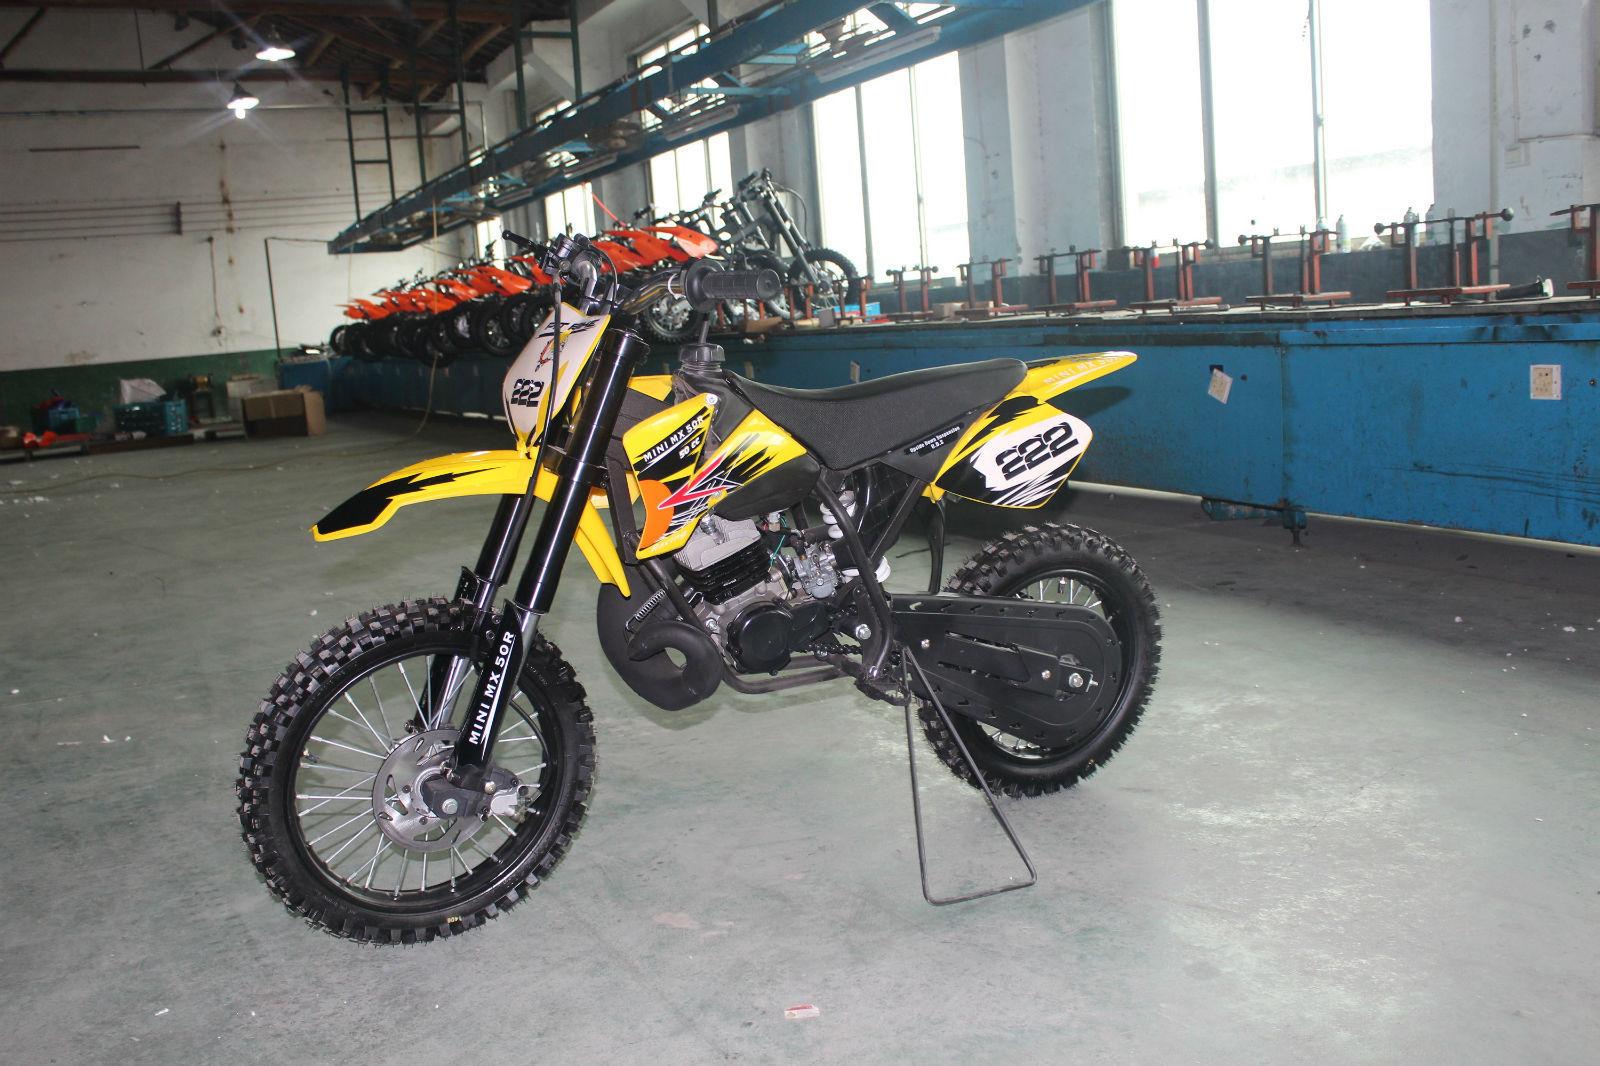 mini mx 50r 50cc moto cross 2 stroke automatic 9hp dirt bike ktm pit bike childs. Black Bedroom Furniture Sets. Home Design Ideas